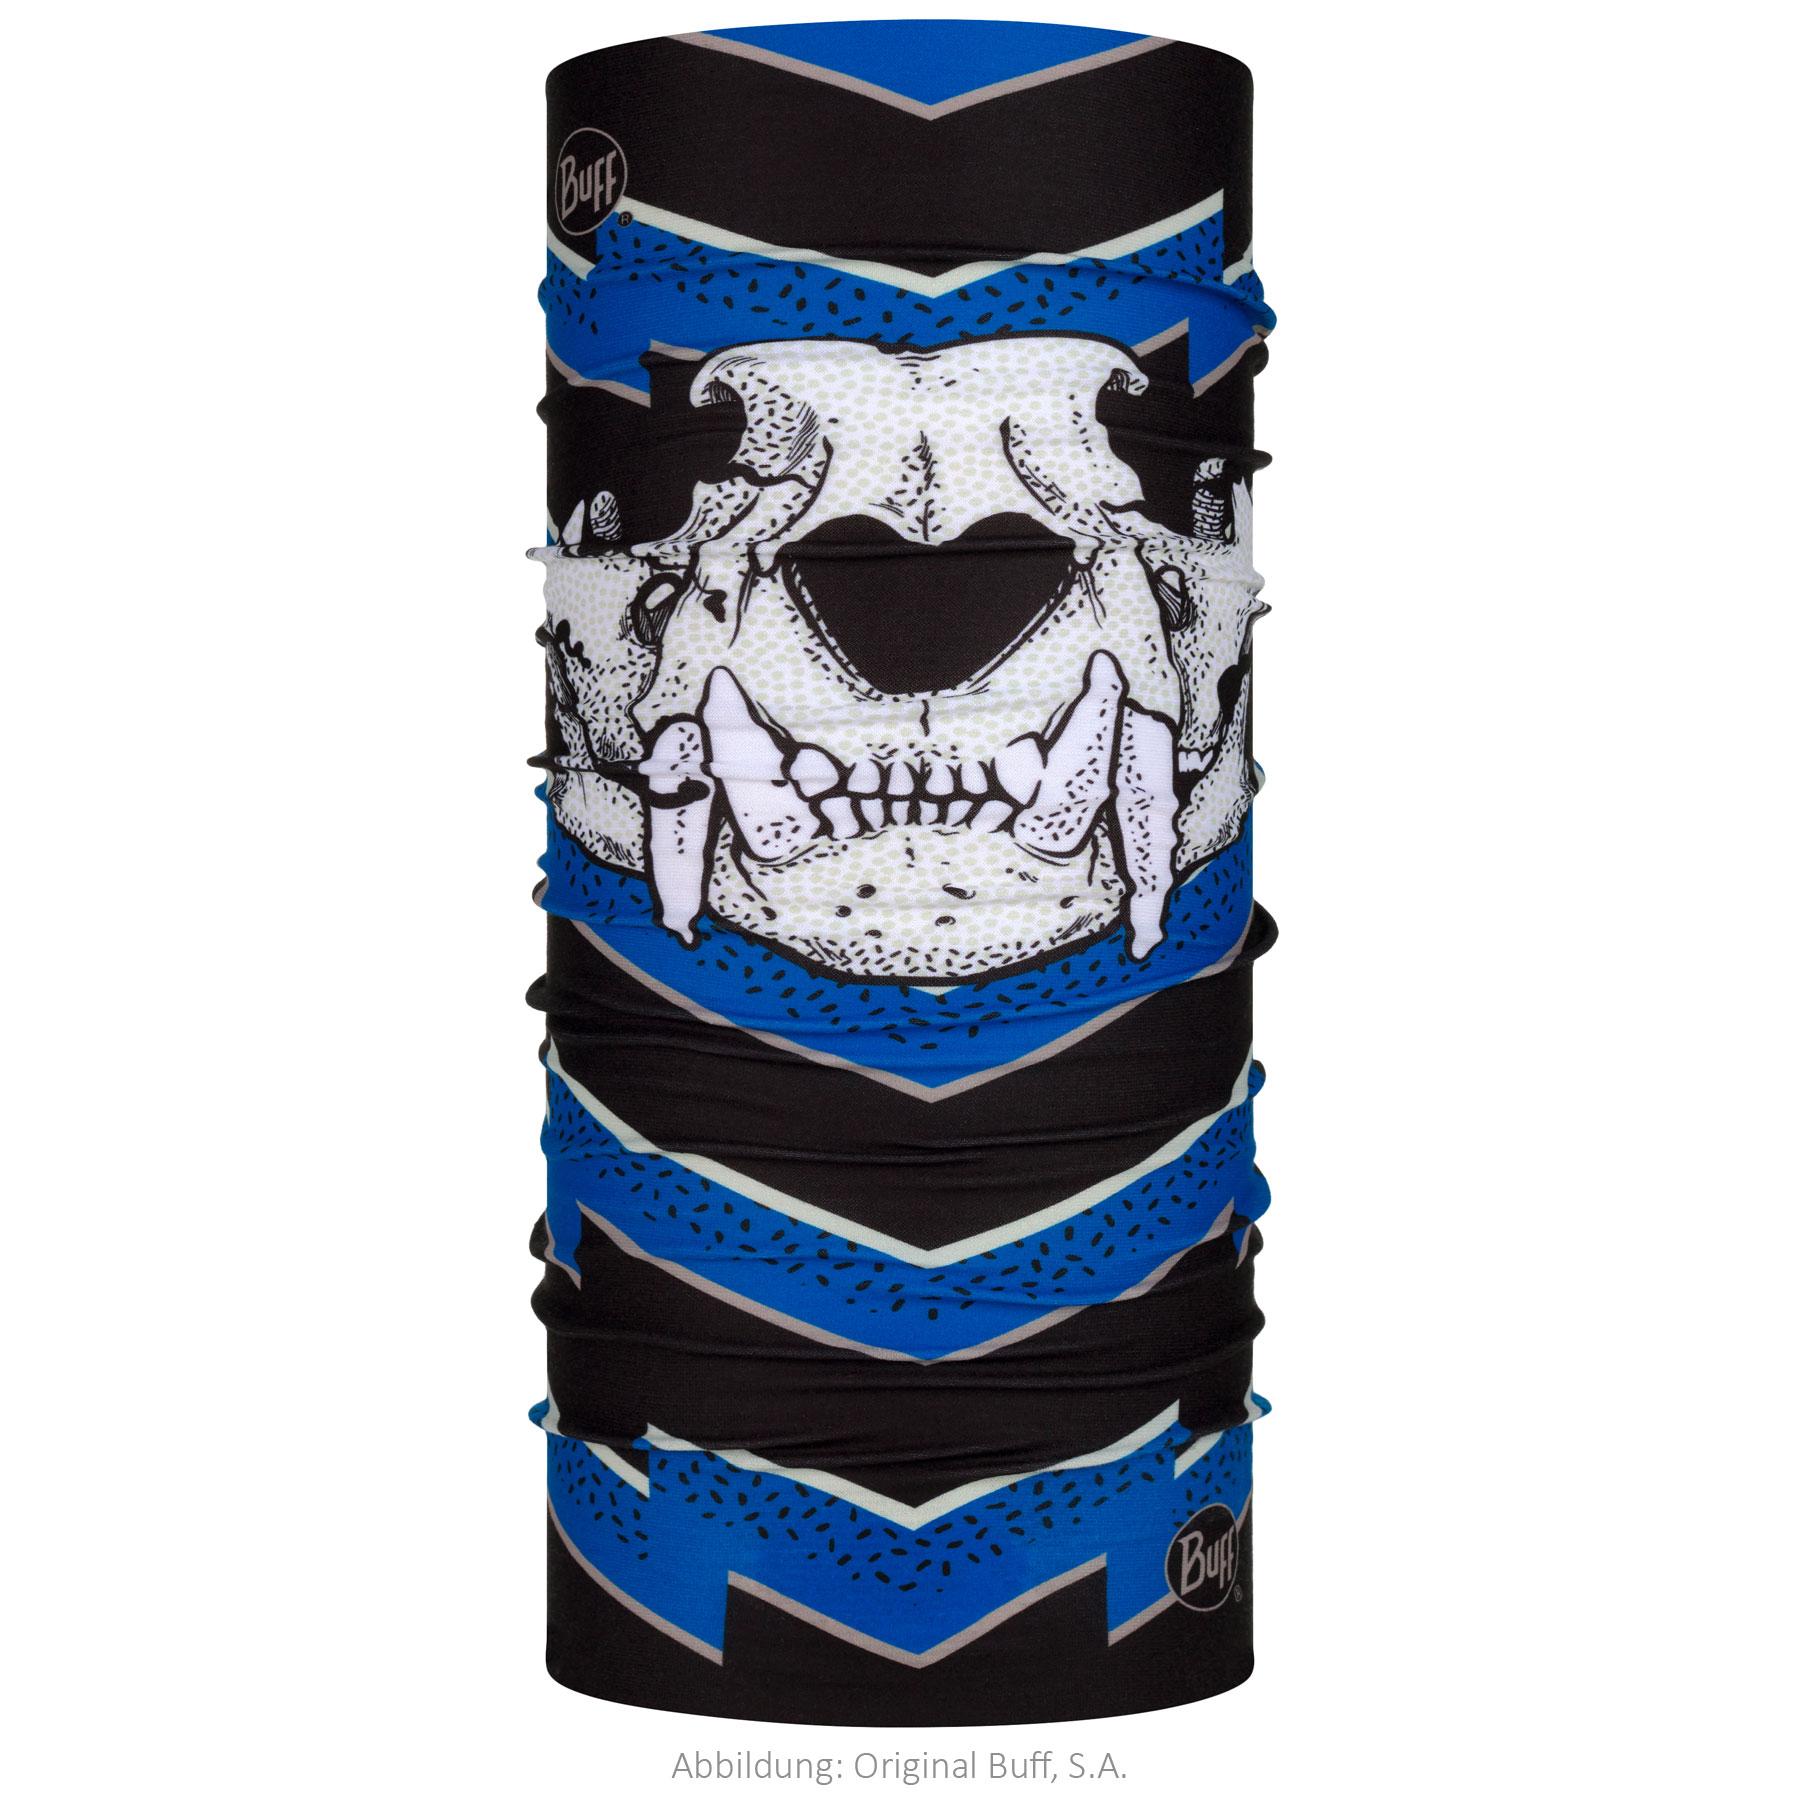 Buff® Original Multifunctional Cloth - T-Knuckle Blue